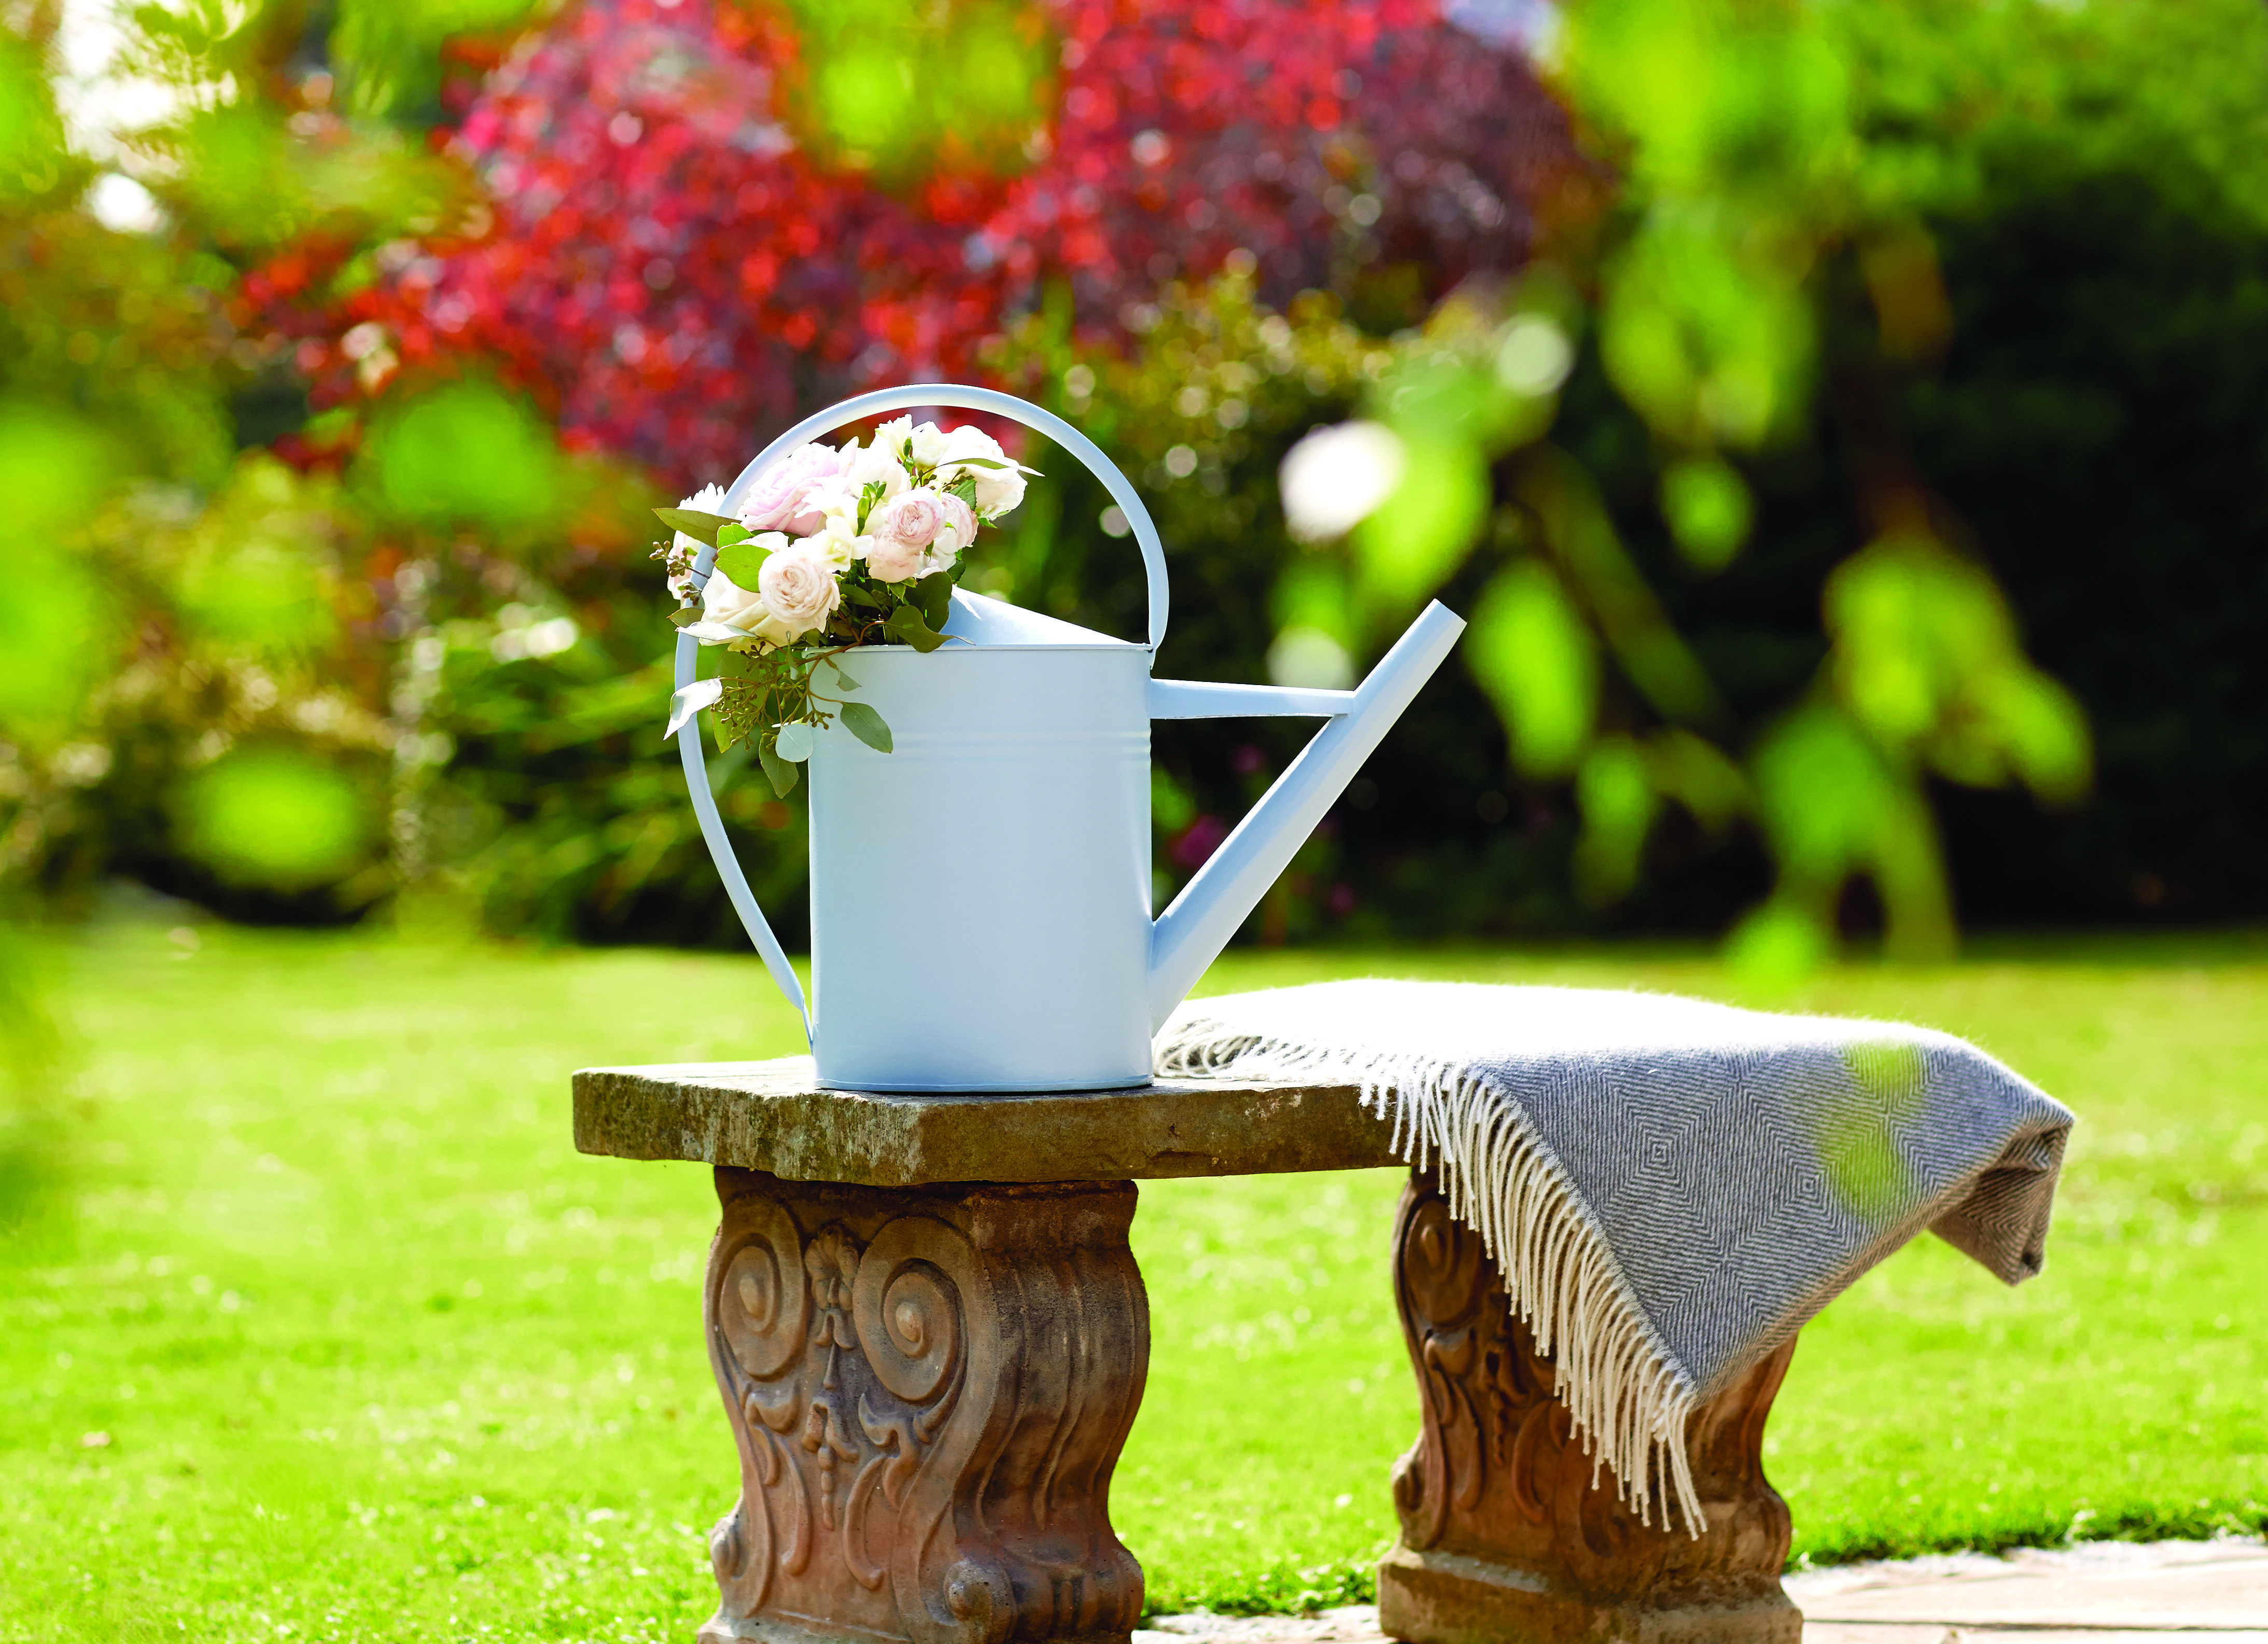 Ronseal Garden Paint in Cool Breeze   Colour in the Garden   Pinterest